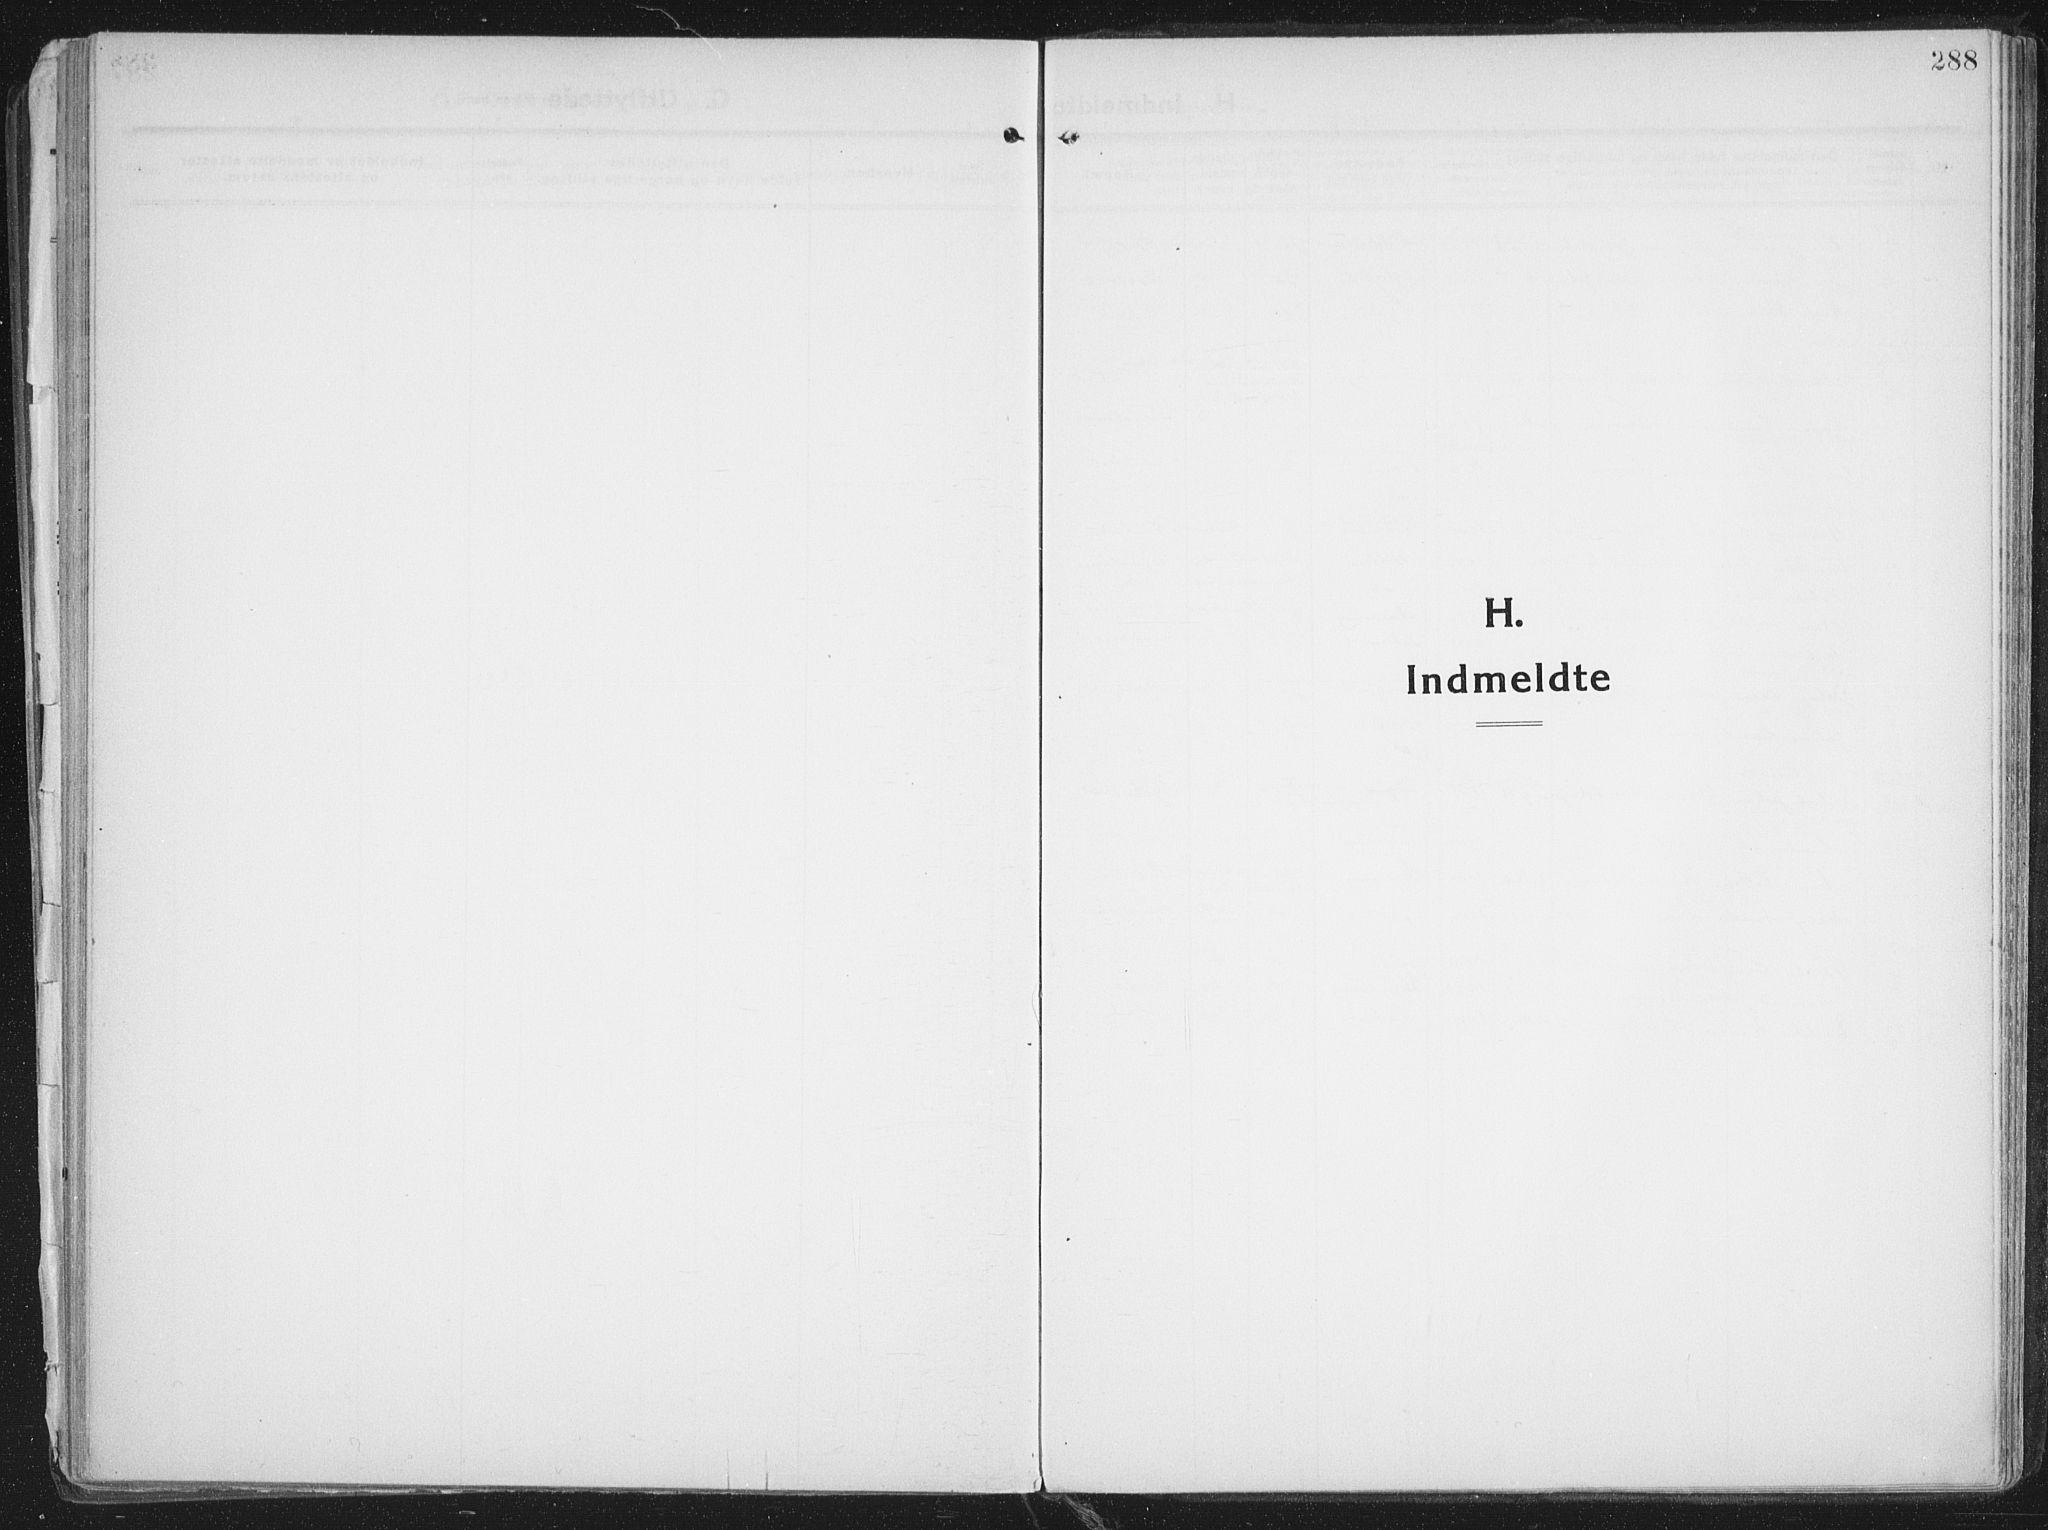 SATØ, Lenvik sokneprestembete, H/Ha: Ministerialbok nr. 16, 1910-1924, s. 288